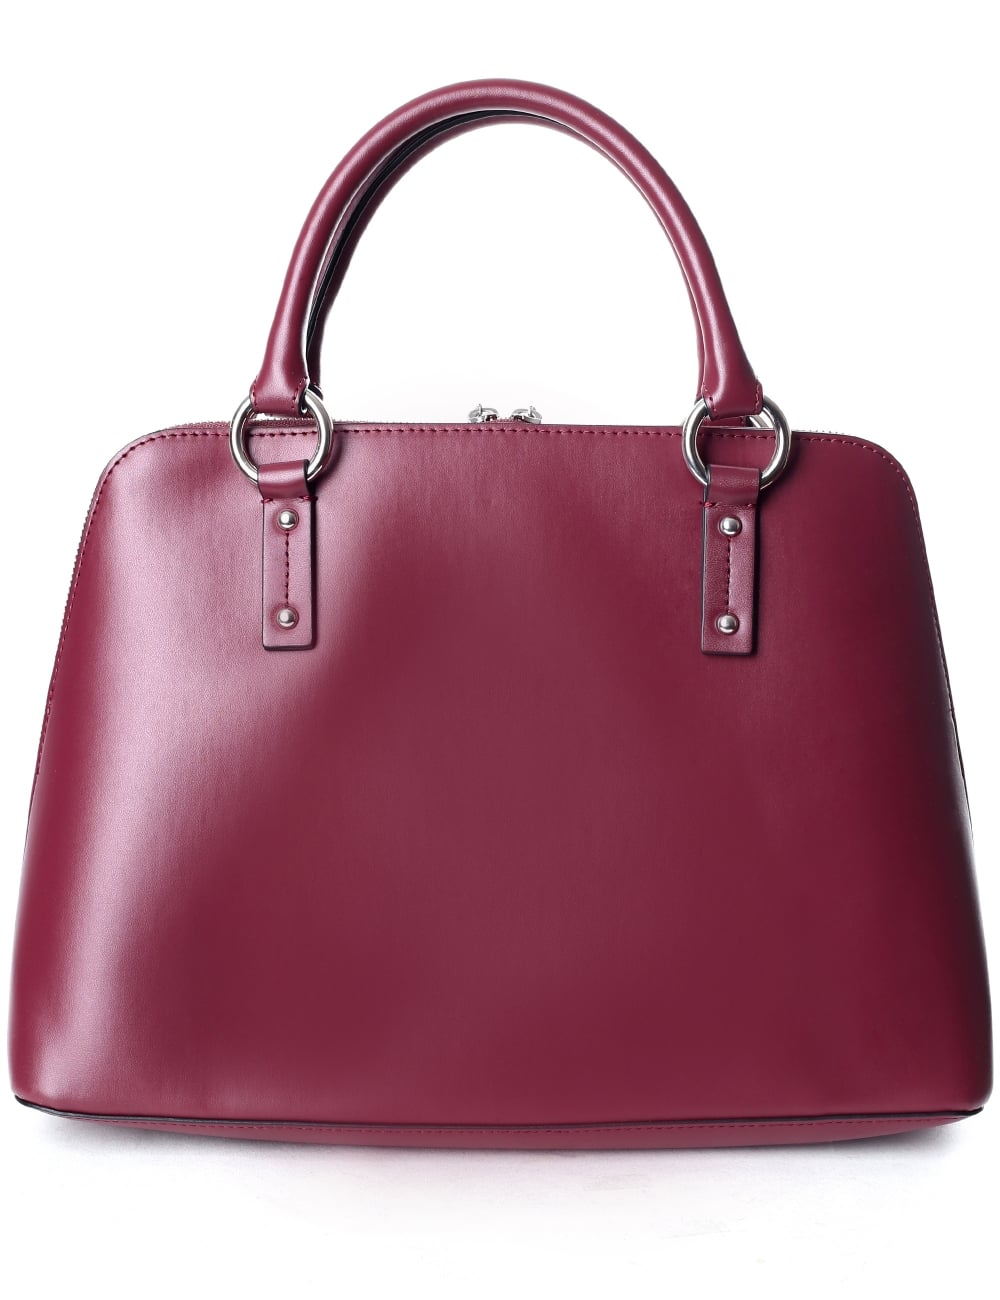 575df234d333 Armani Jeans Women s Top Handle Bag Burgundy